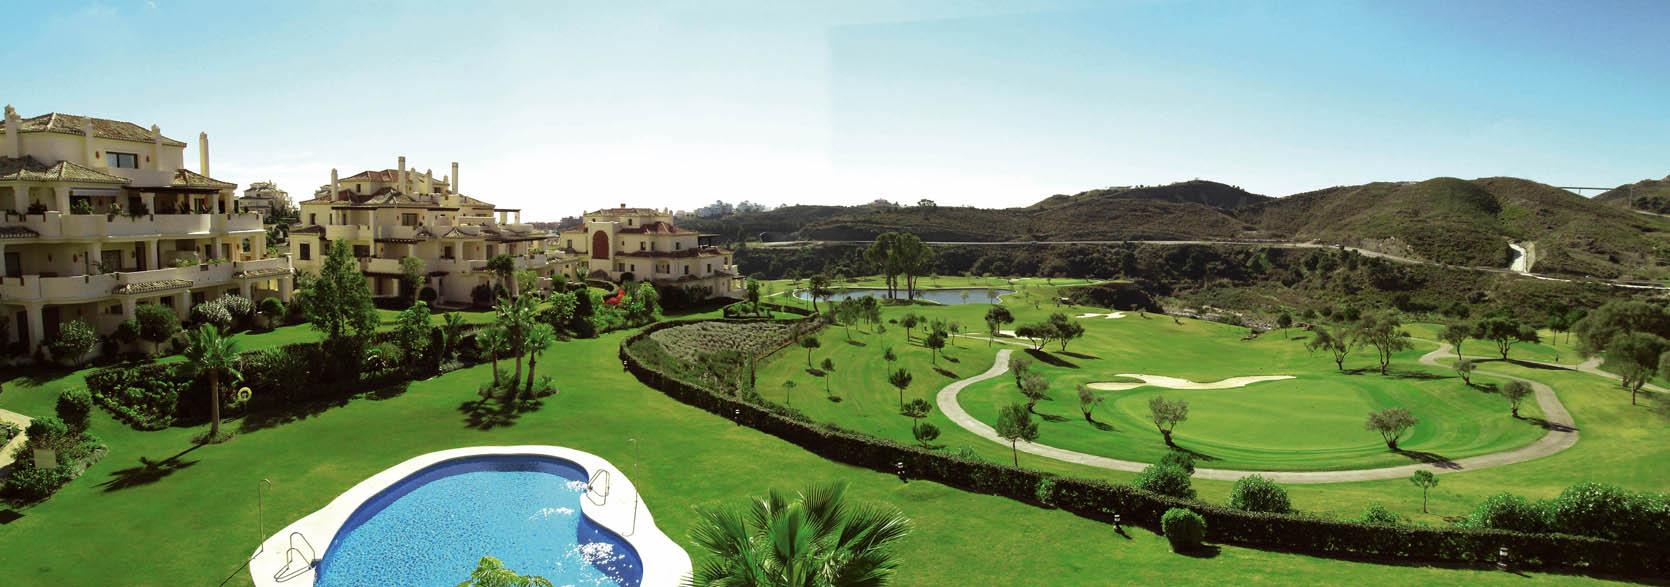 Golf__Pool1